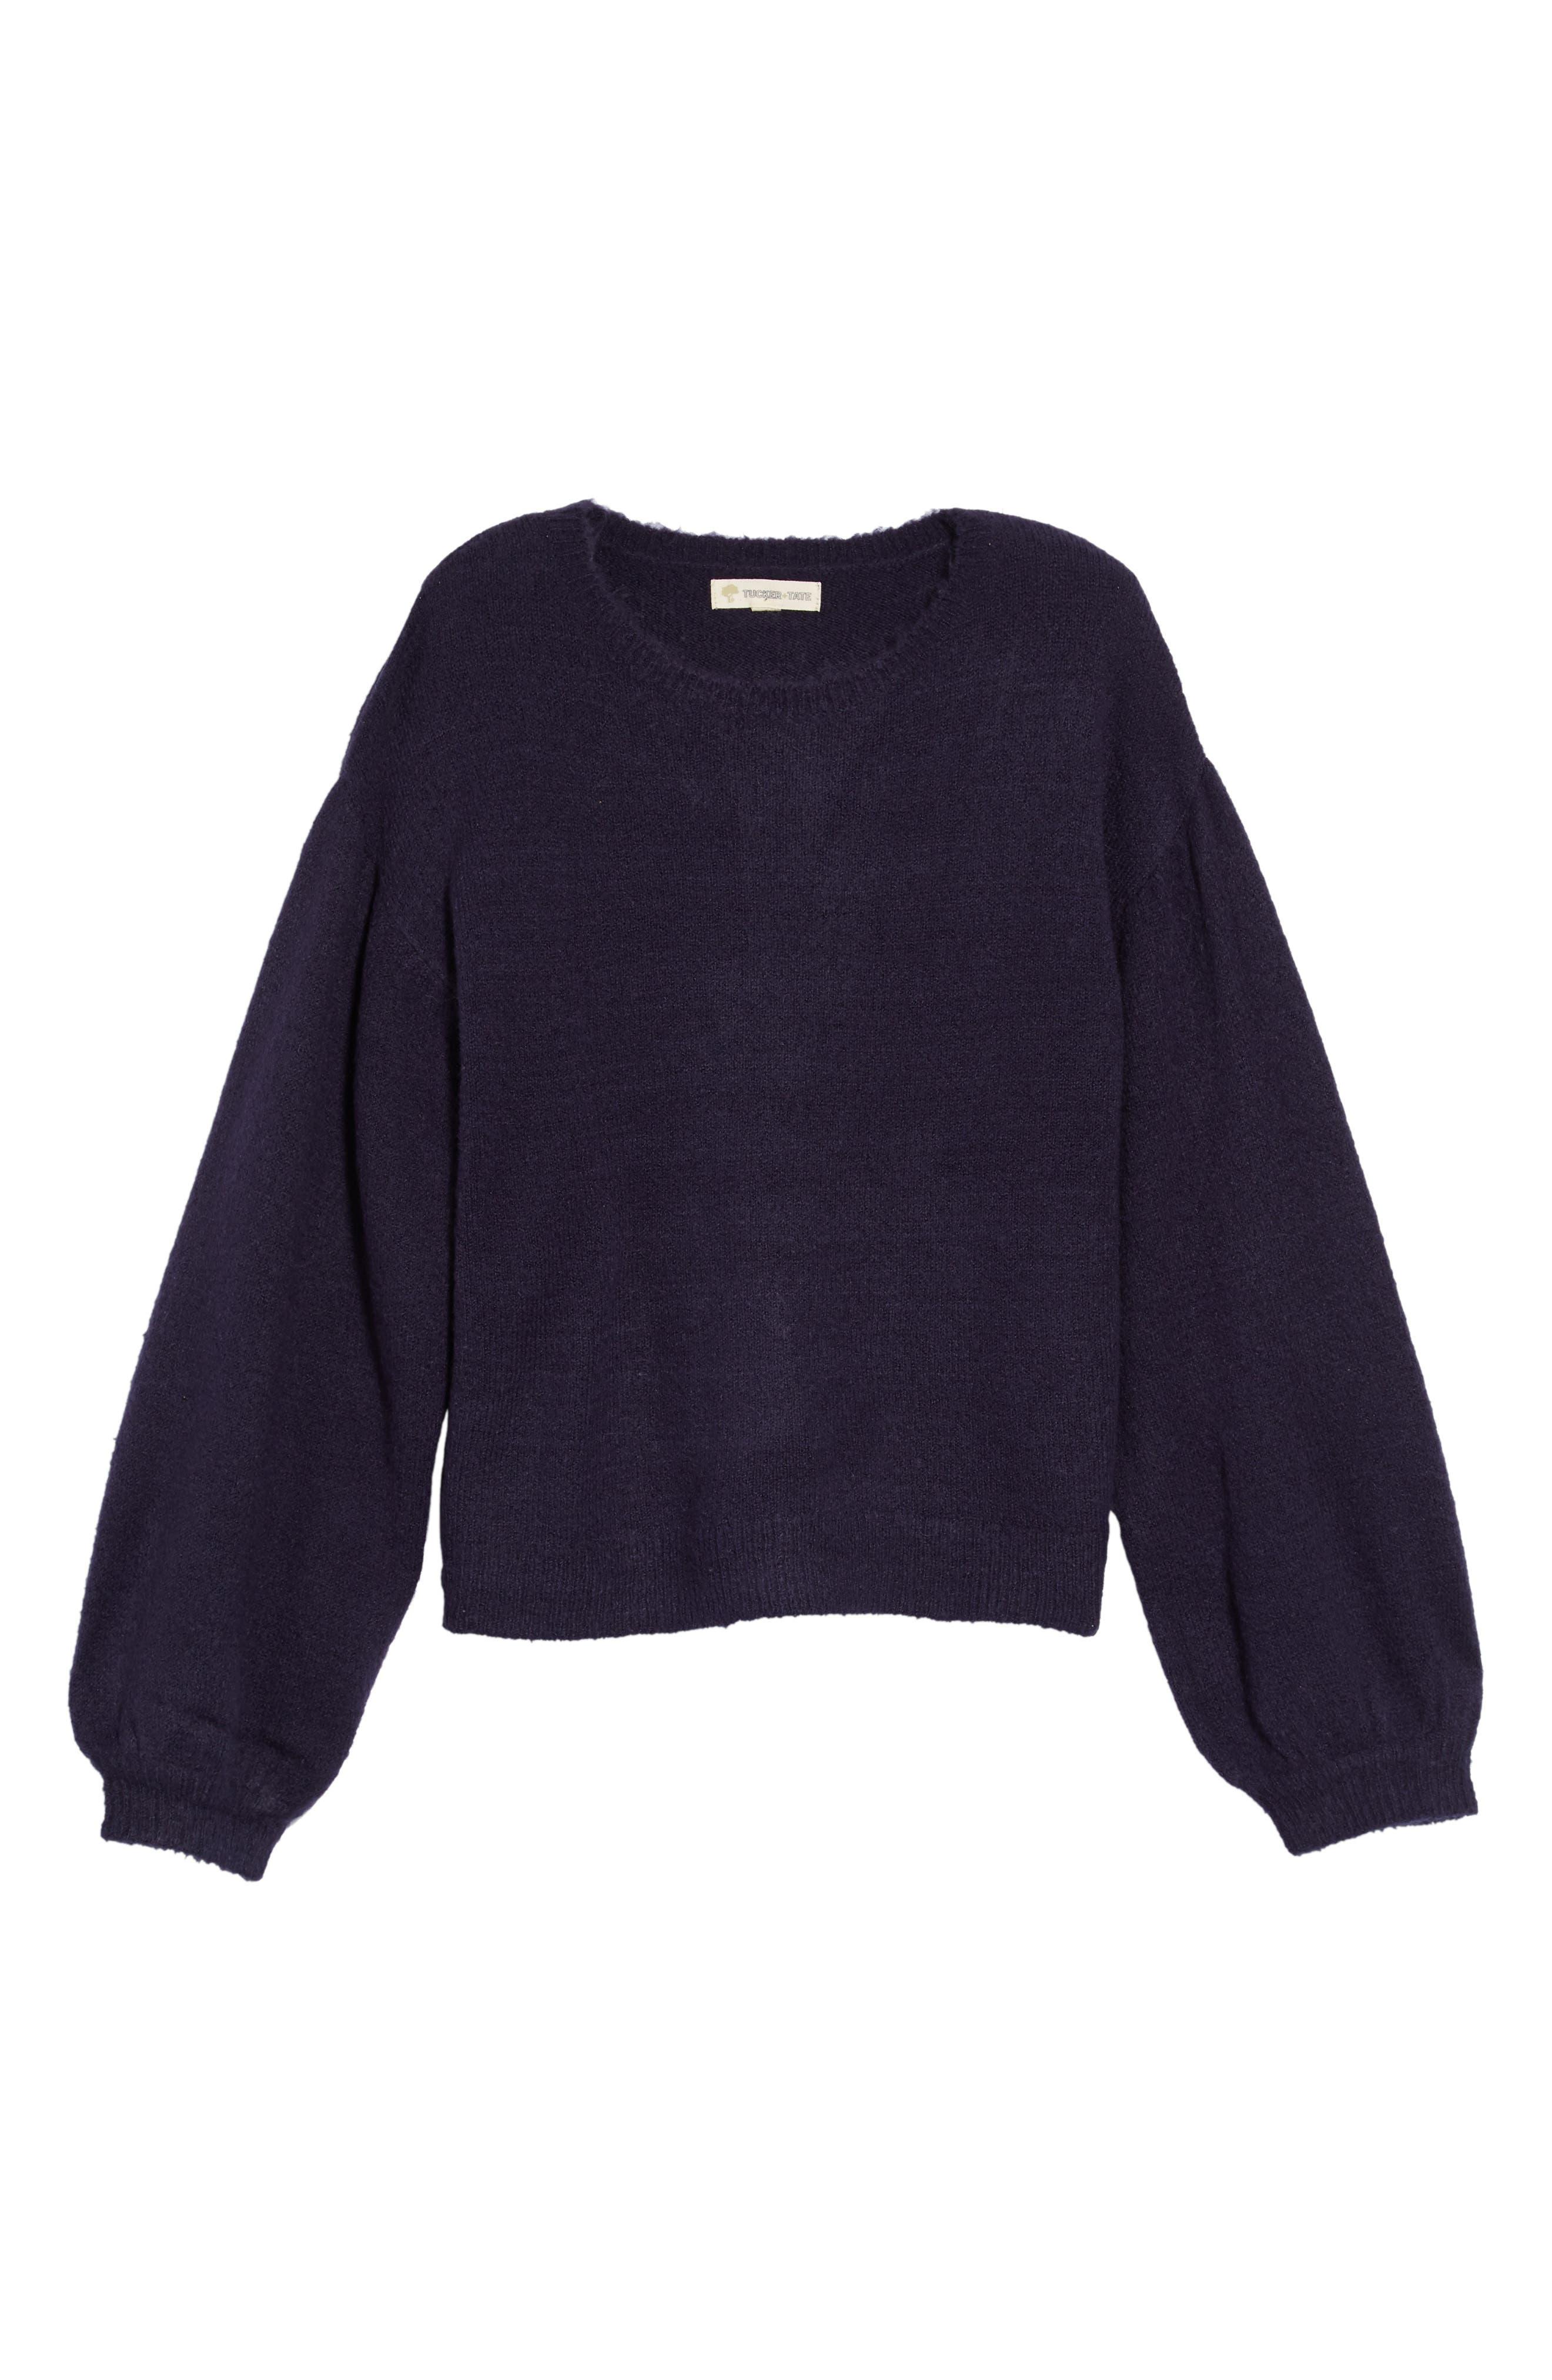 Bubble Sleeve Sweater,                         Main,                         color, NAVY PEACOAT